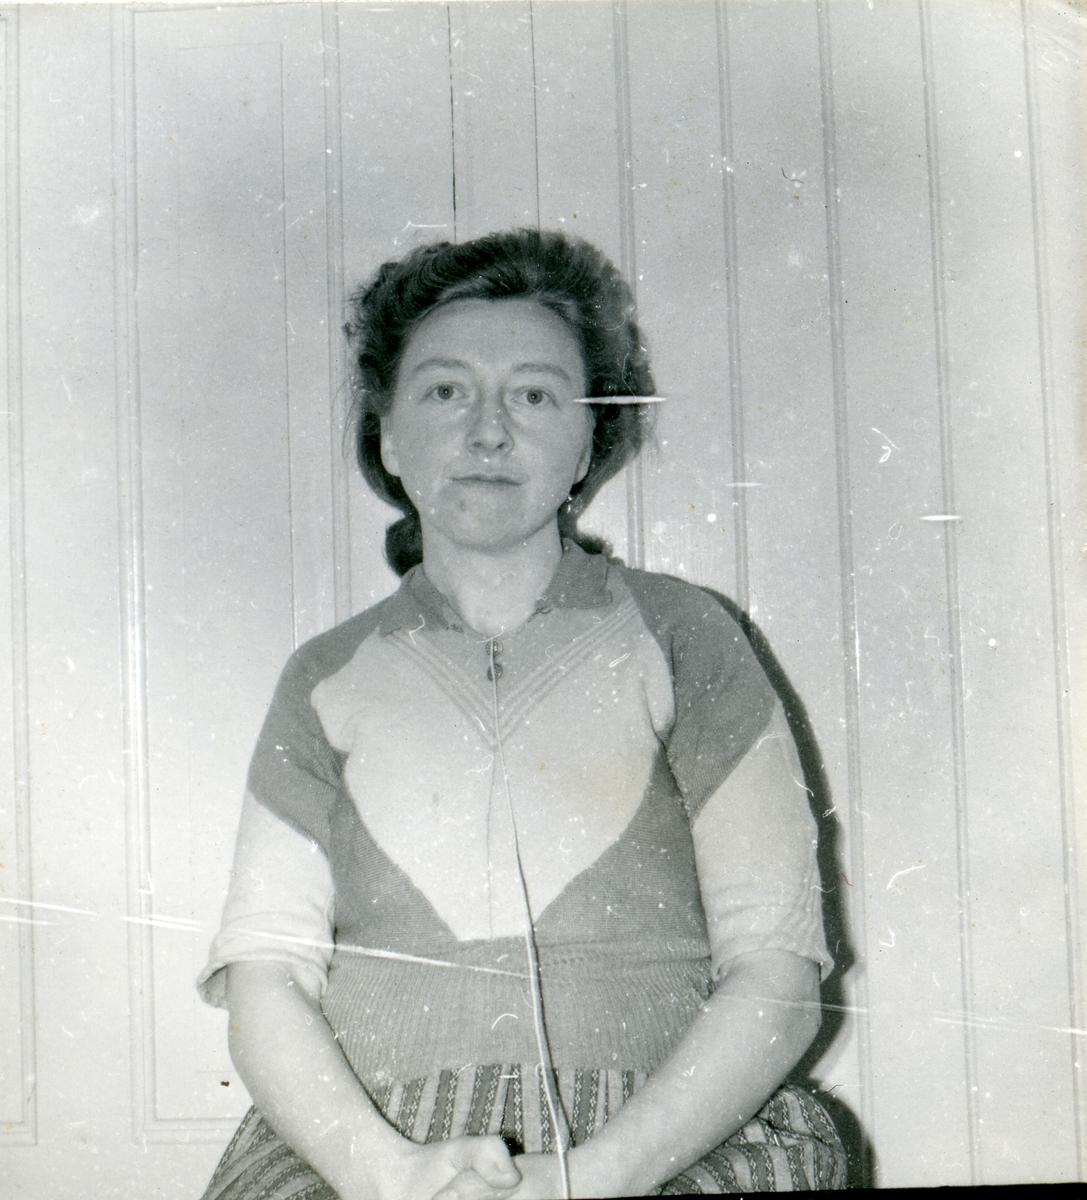 Kari Schlytter.